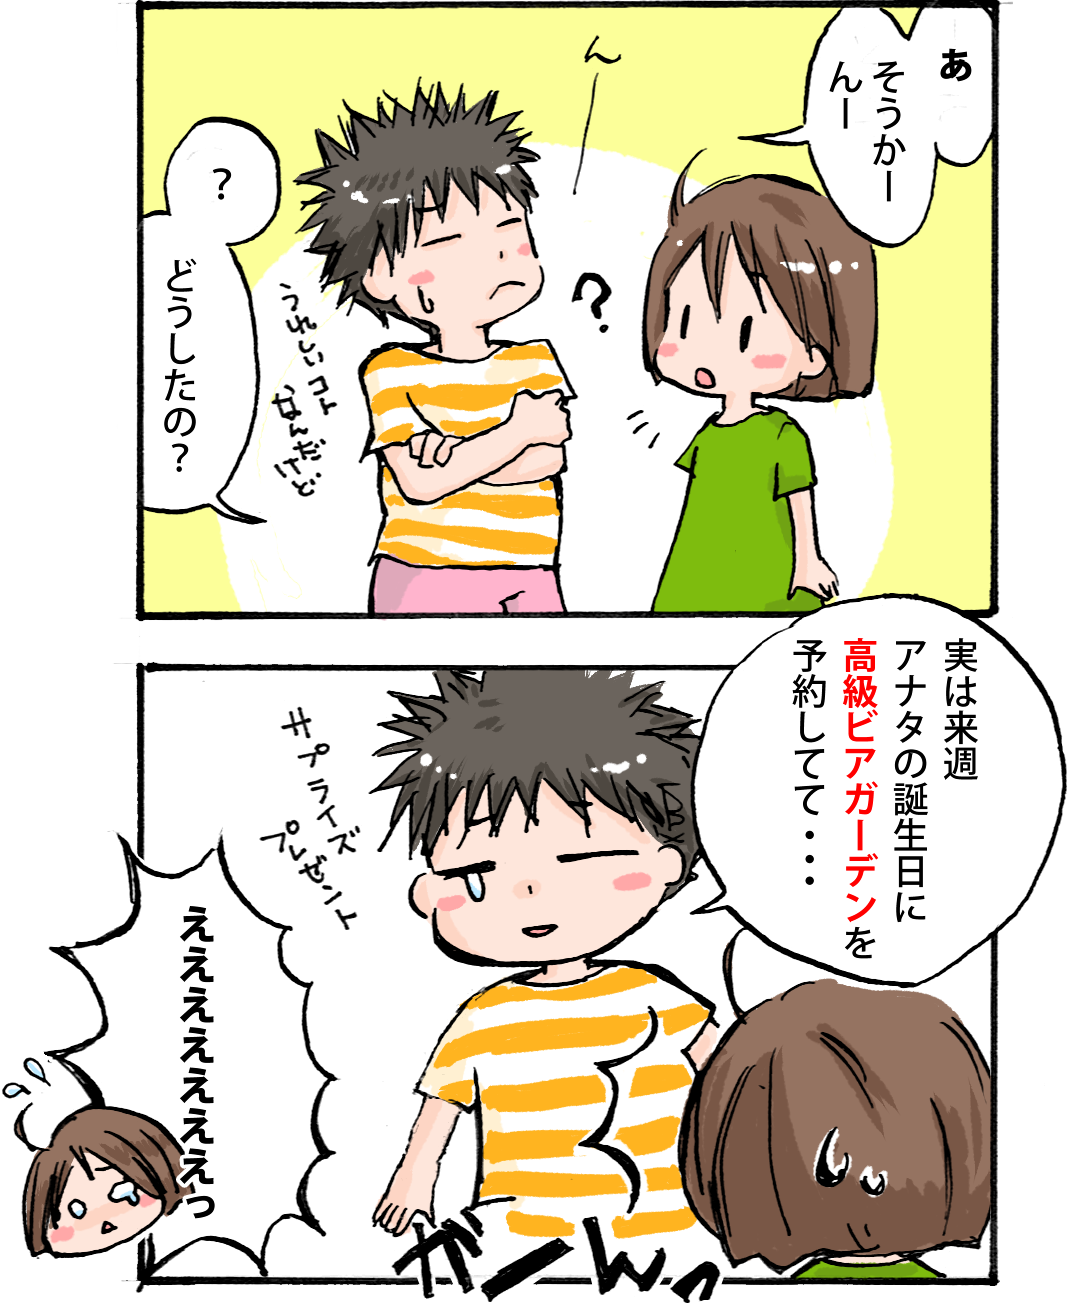 comic02c